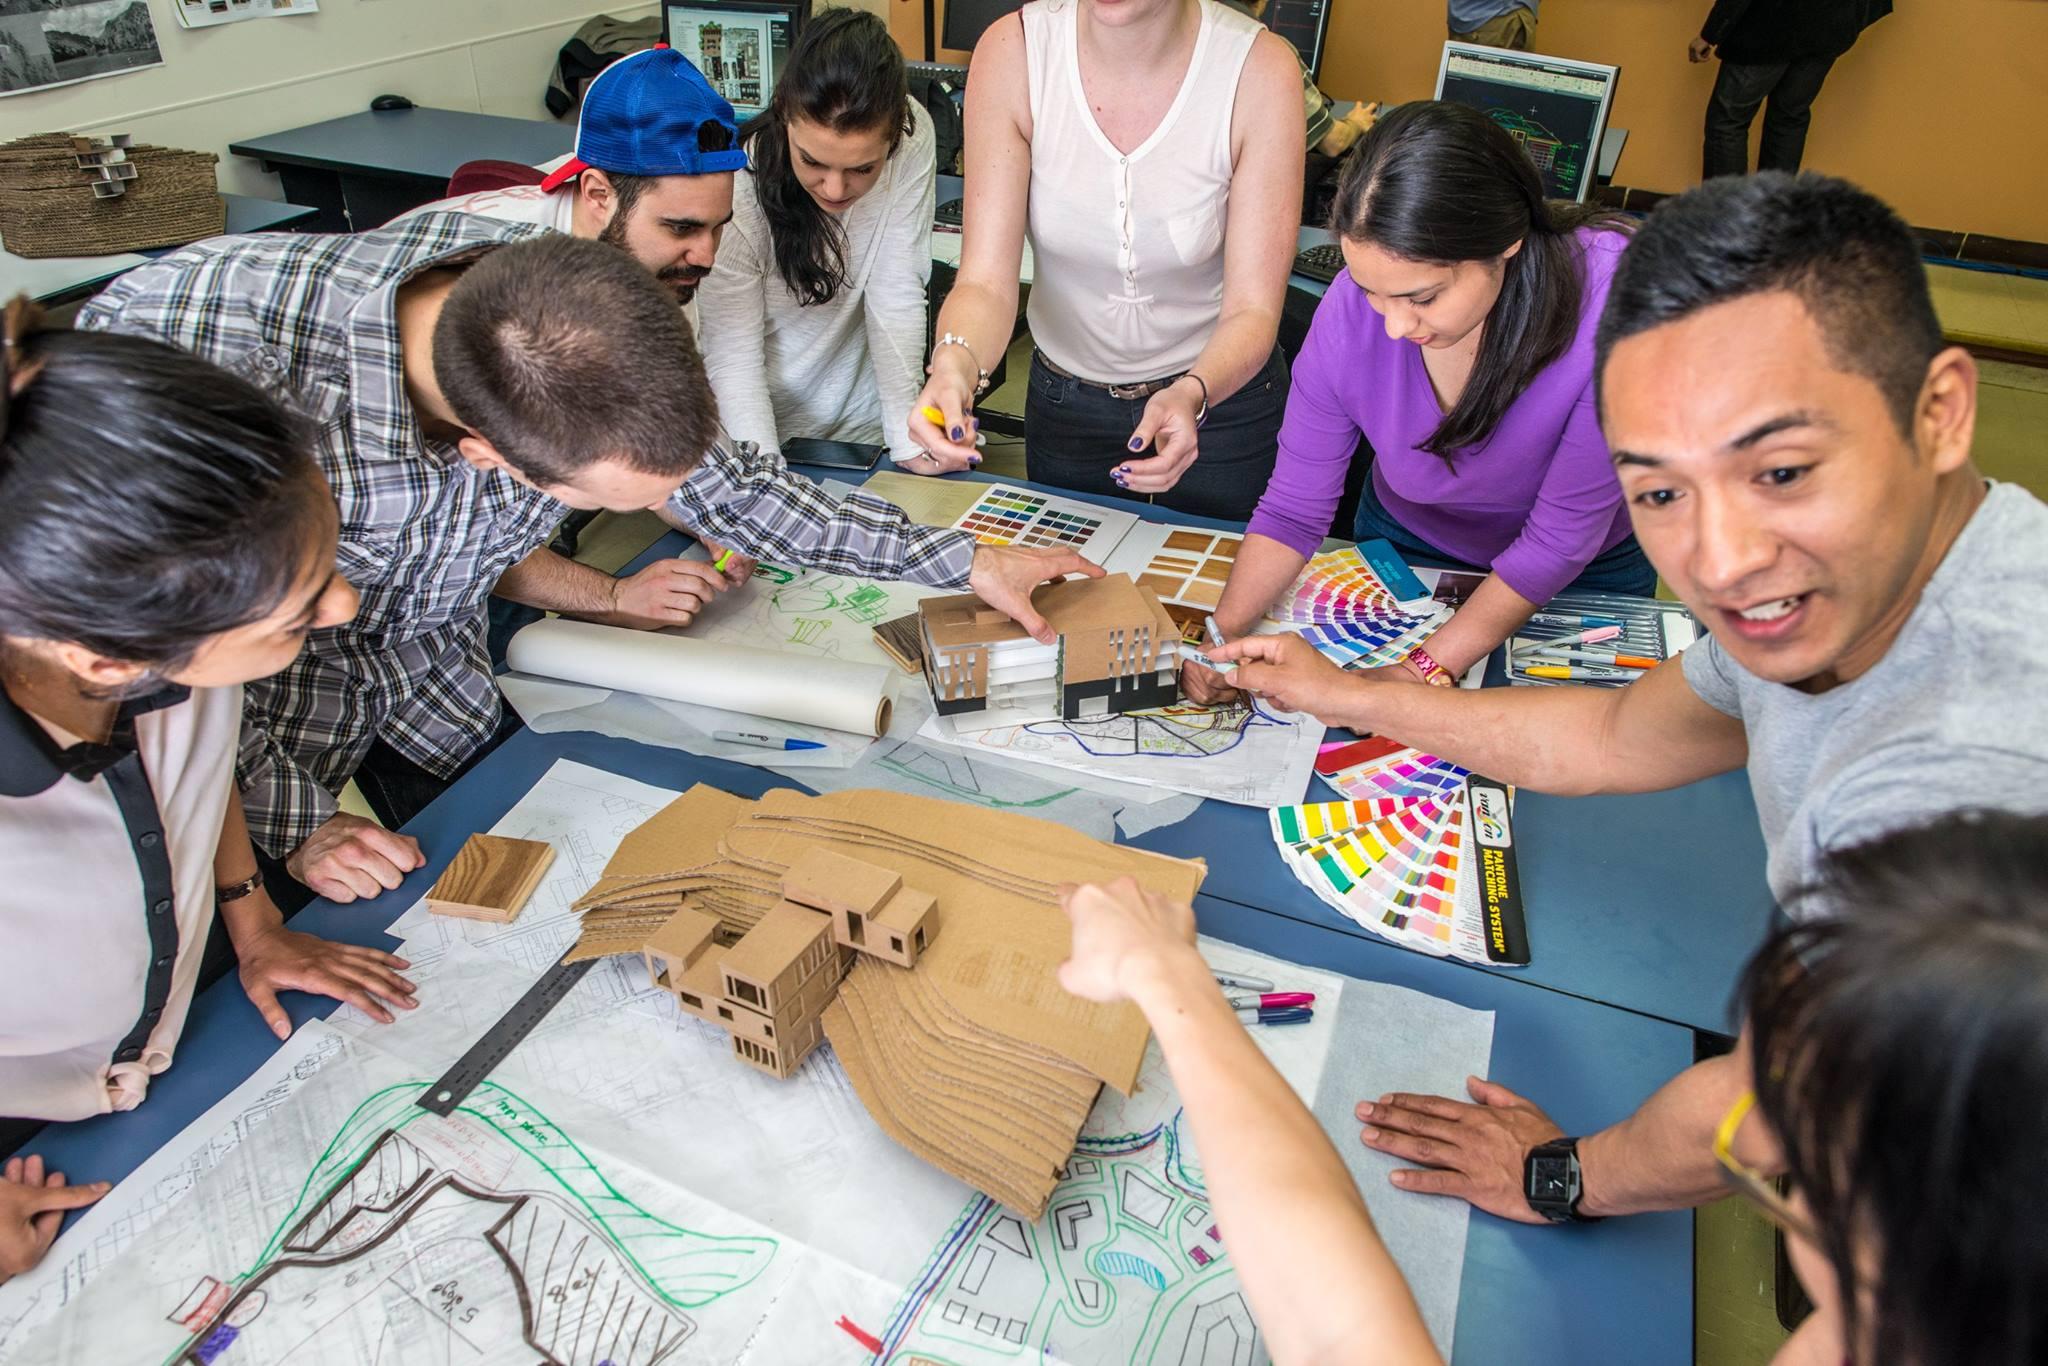 design students at Herzing